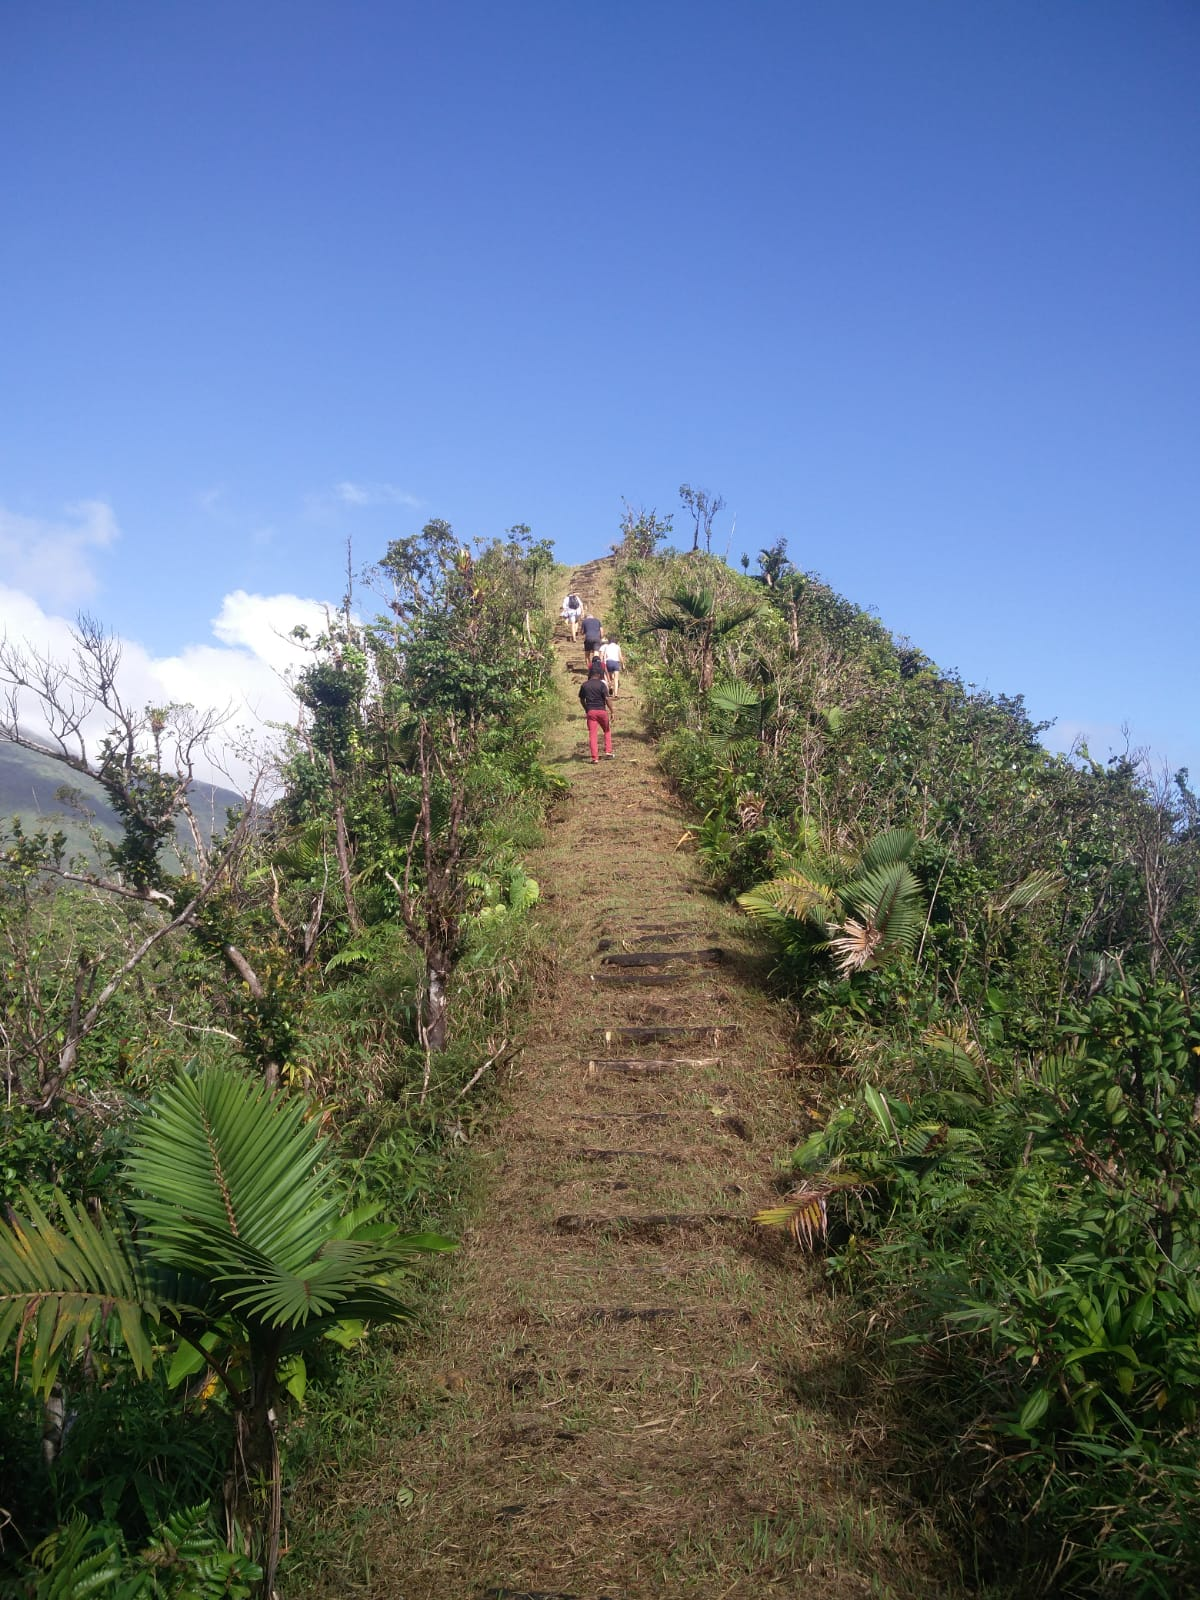 The Freshwater Lake Trail